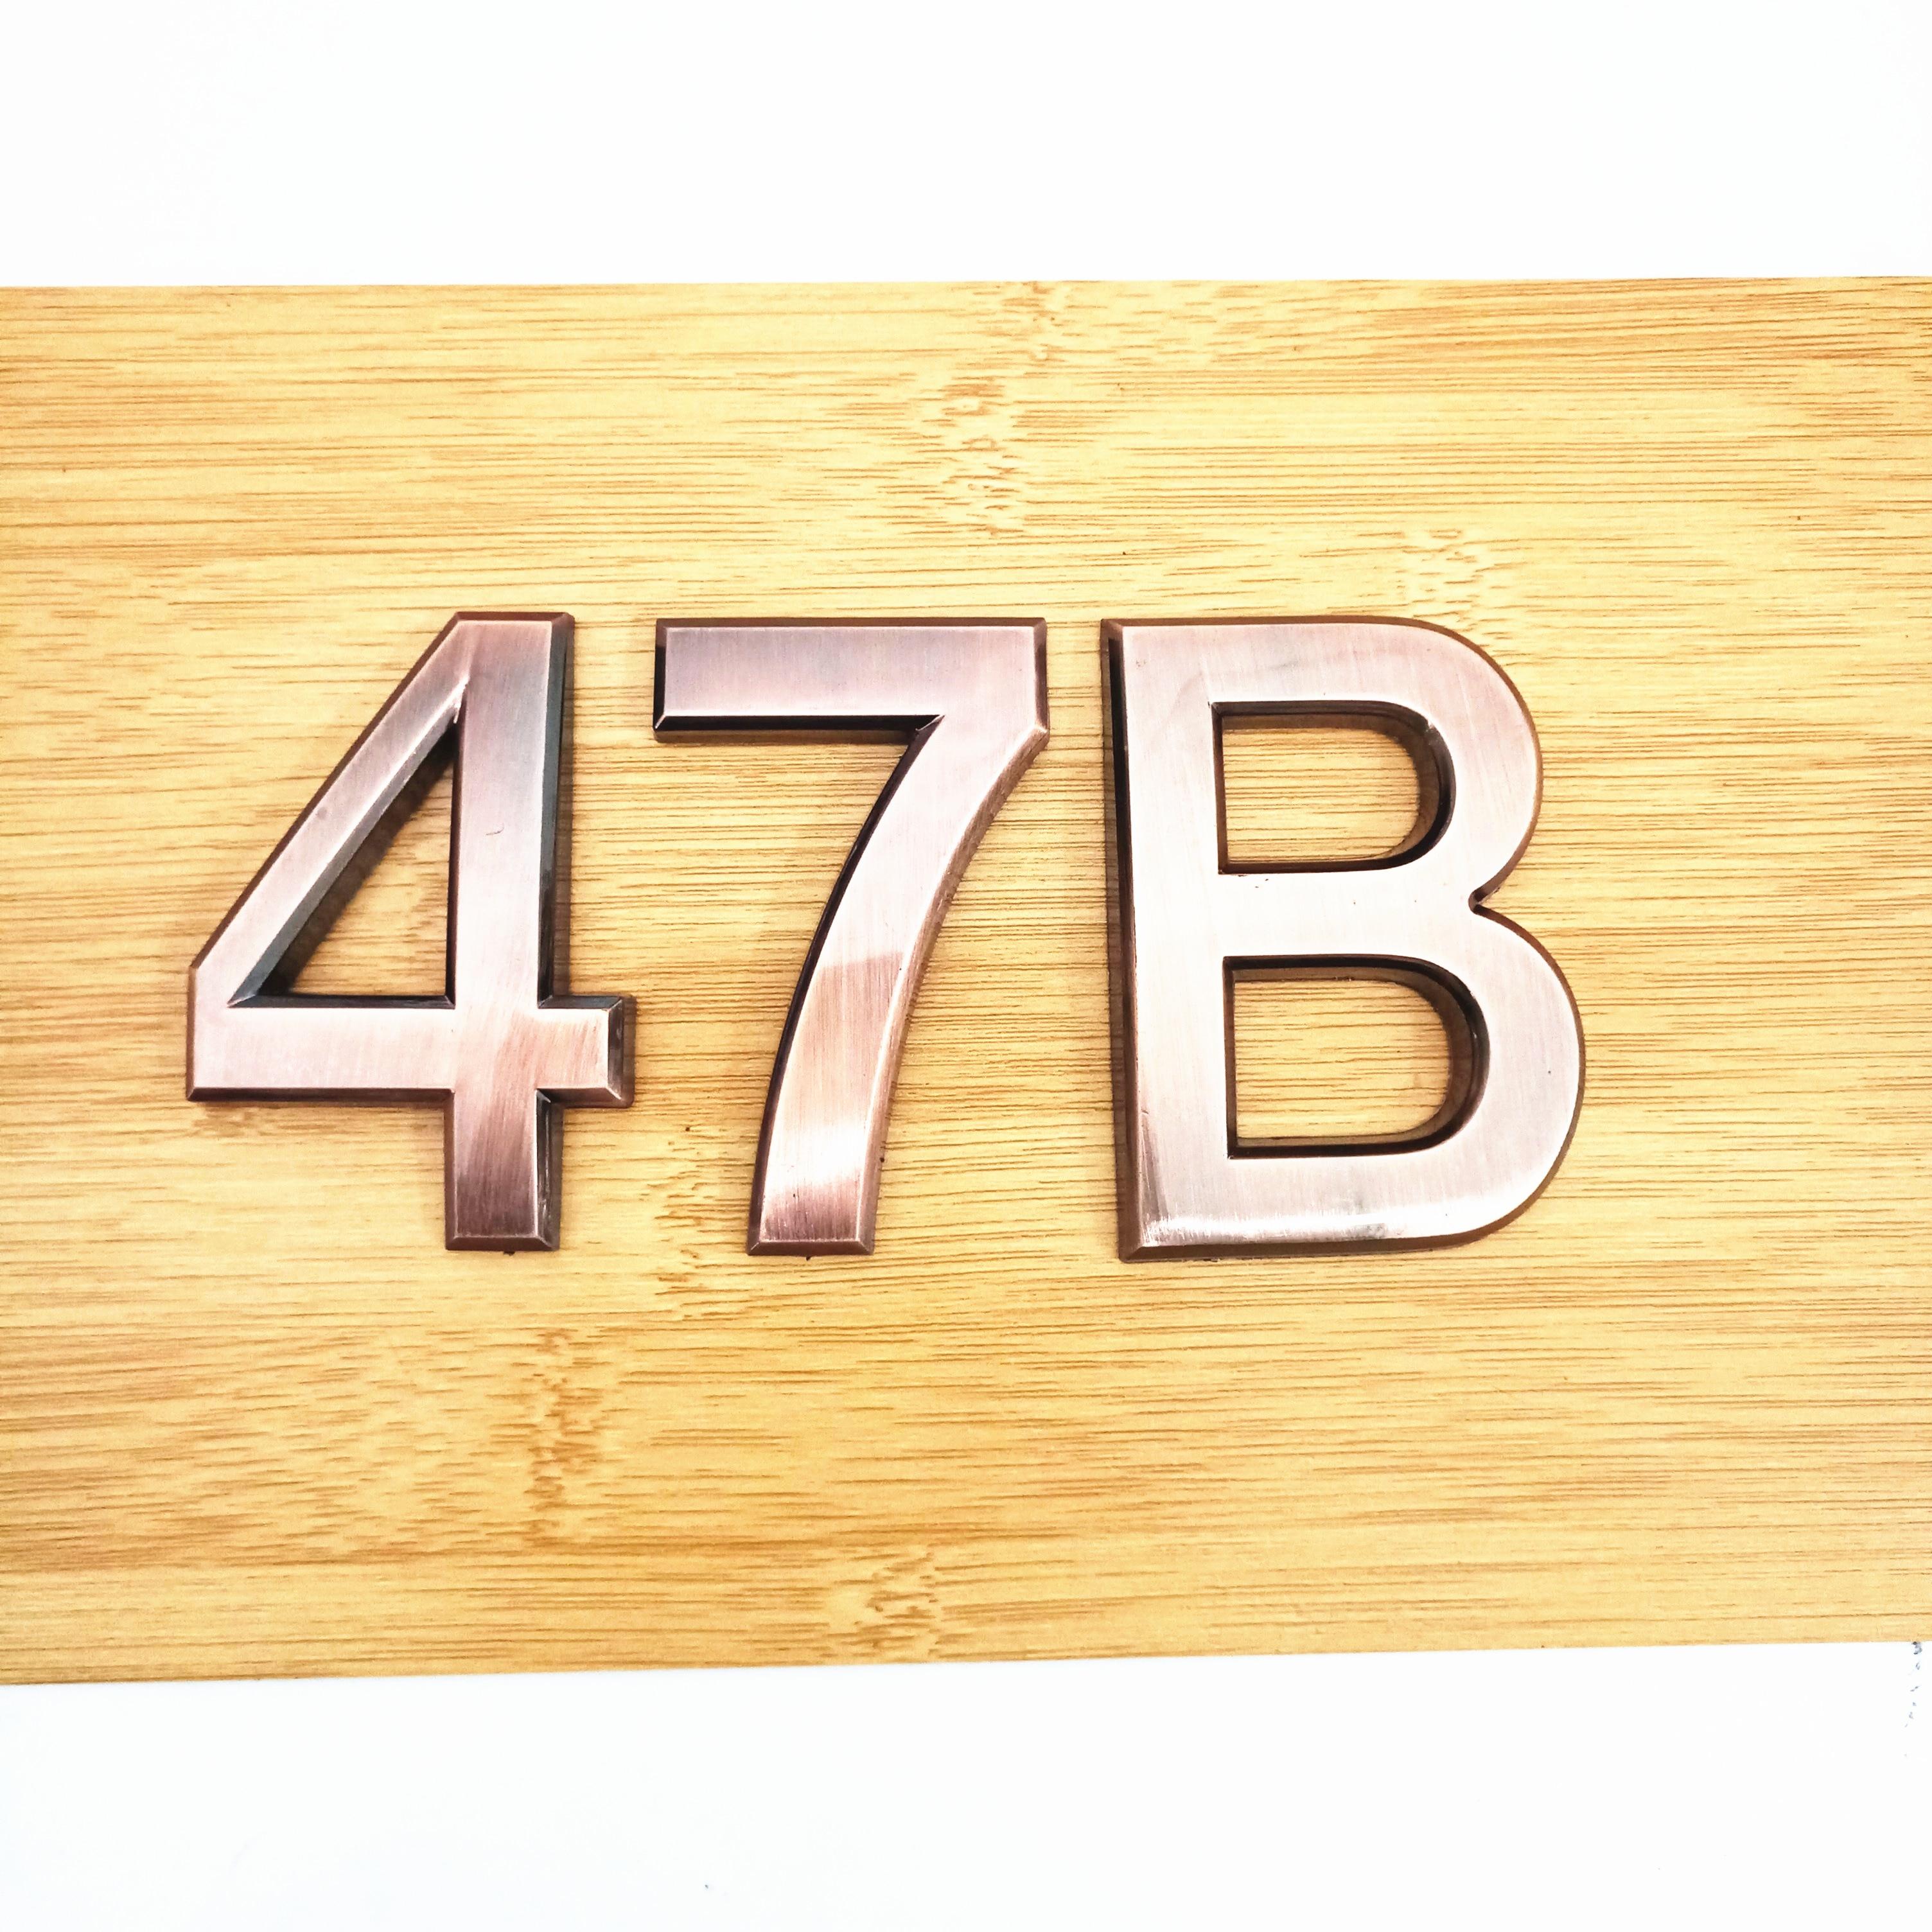 5cm/7cm Door Plate 0123456789A-Z Bronze Color ABS Plastic Plaque Number House Hotel Door Address Digits Sticker Plate Sign(China)